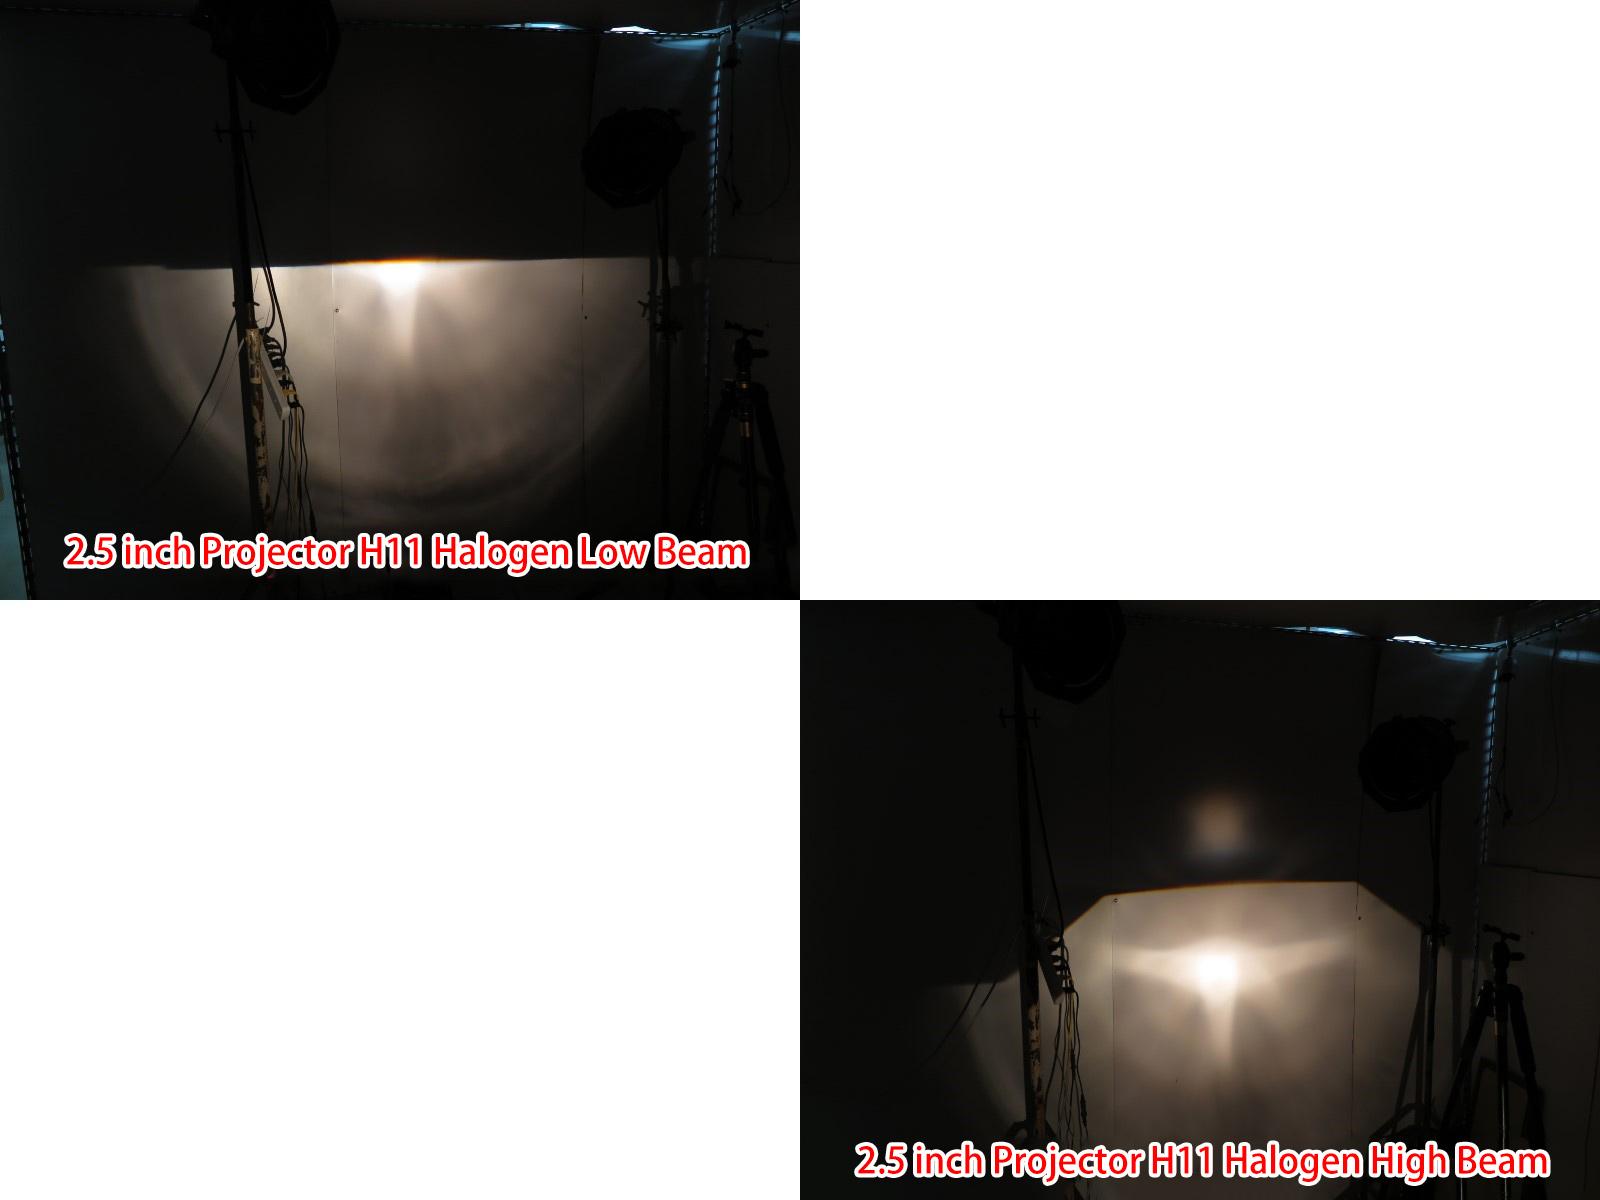 thumbnail 6 - VERSA N17 MK2 2012-2019 Sedan 4D Projector Dual Beam Fog Light Black for NISSAN